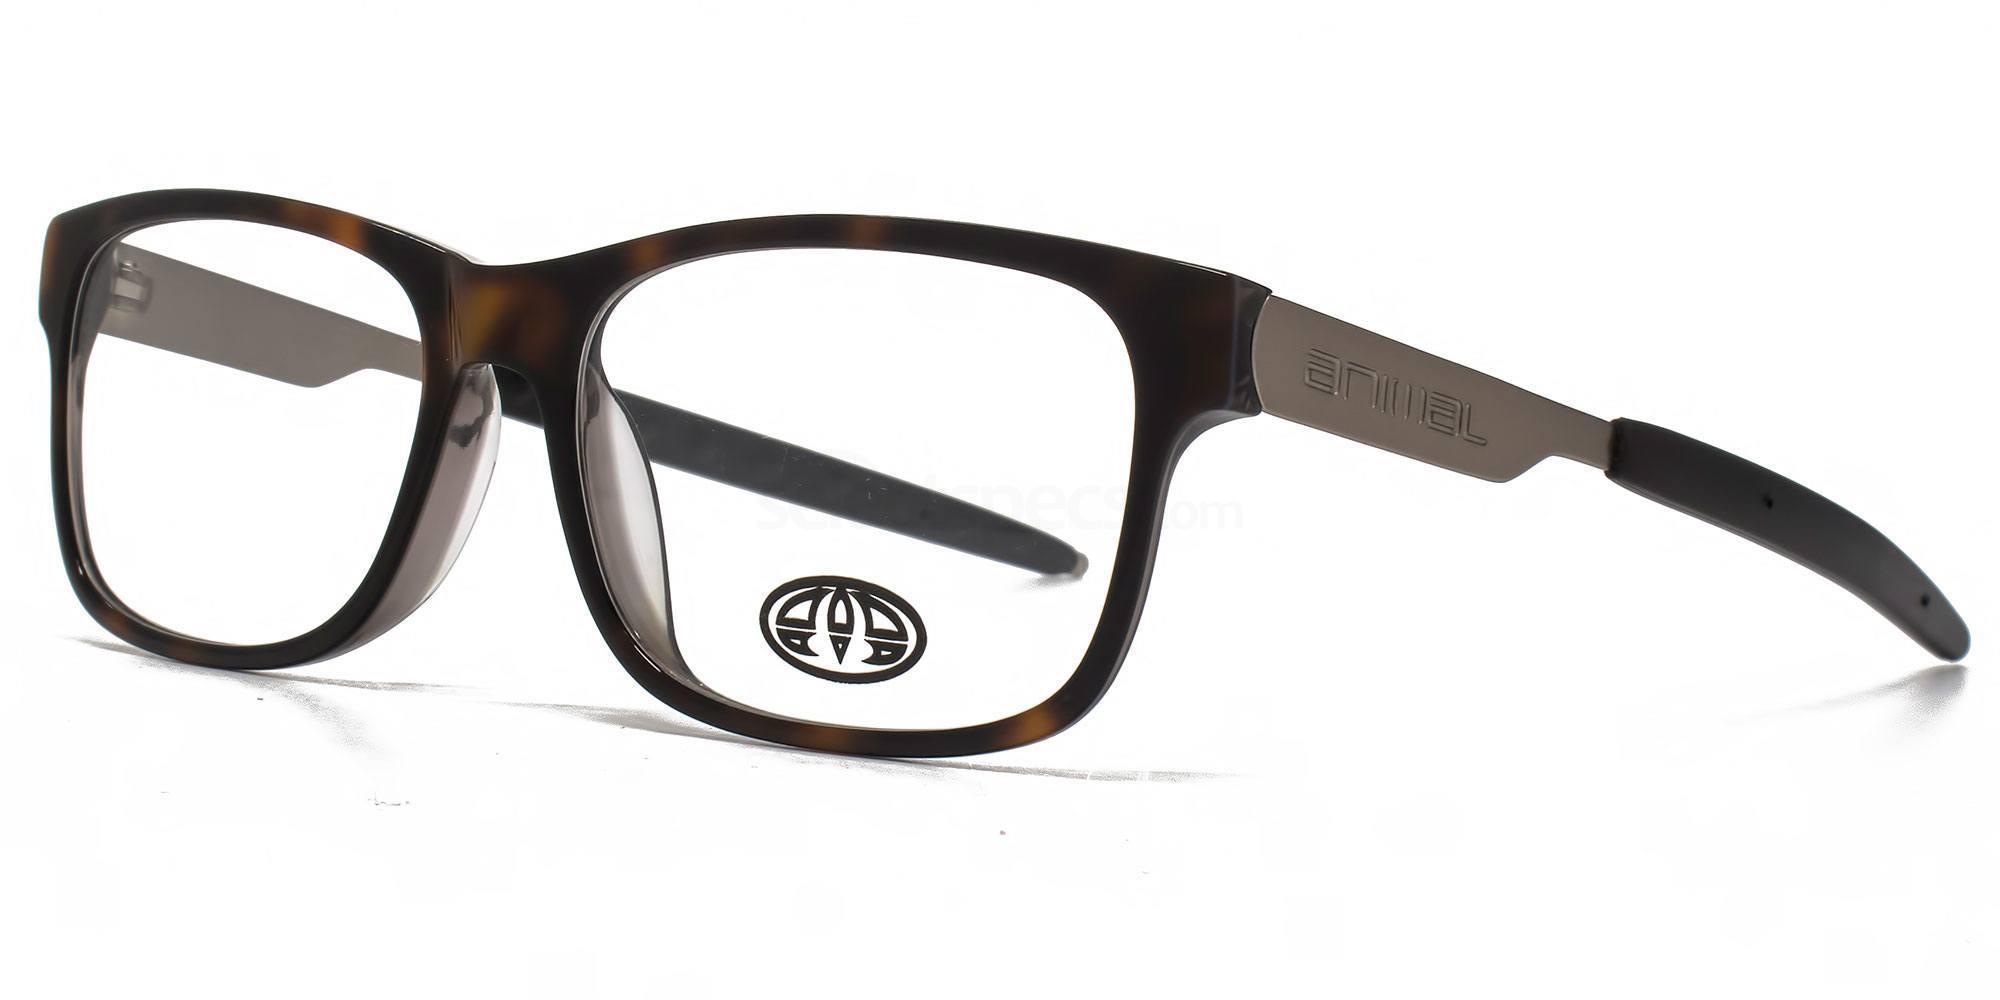 BRN ANIS008 - HARISS Glasses, Animal